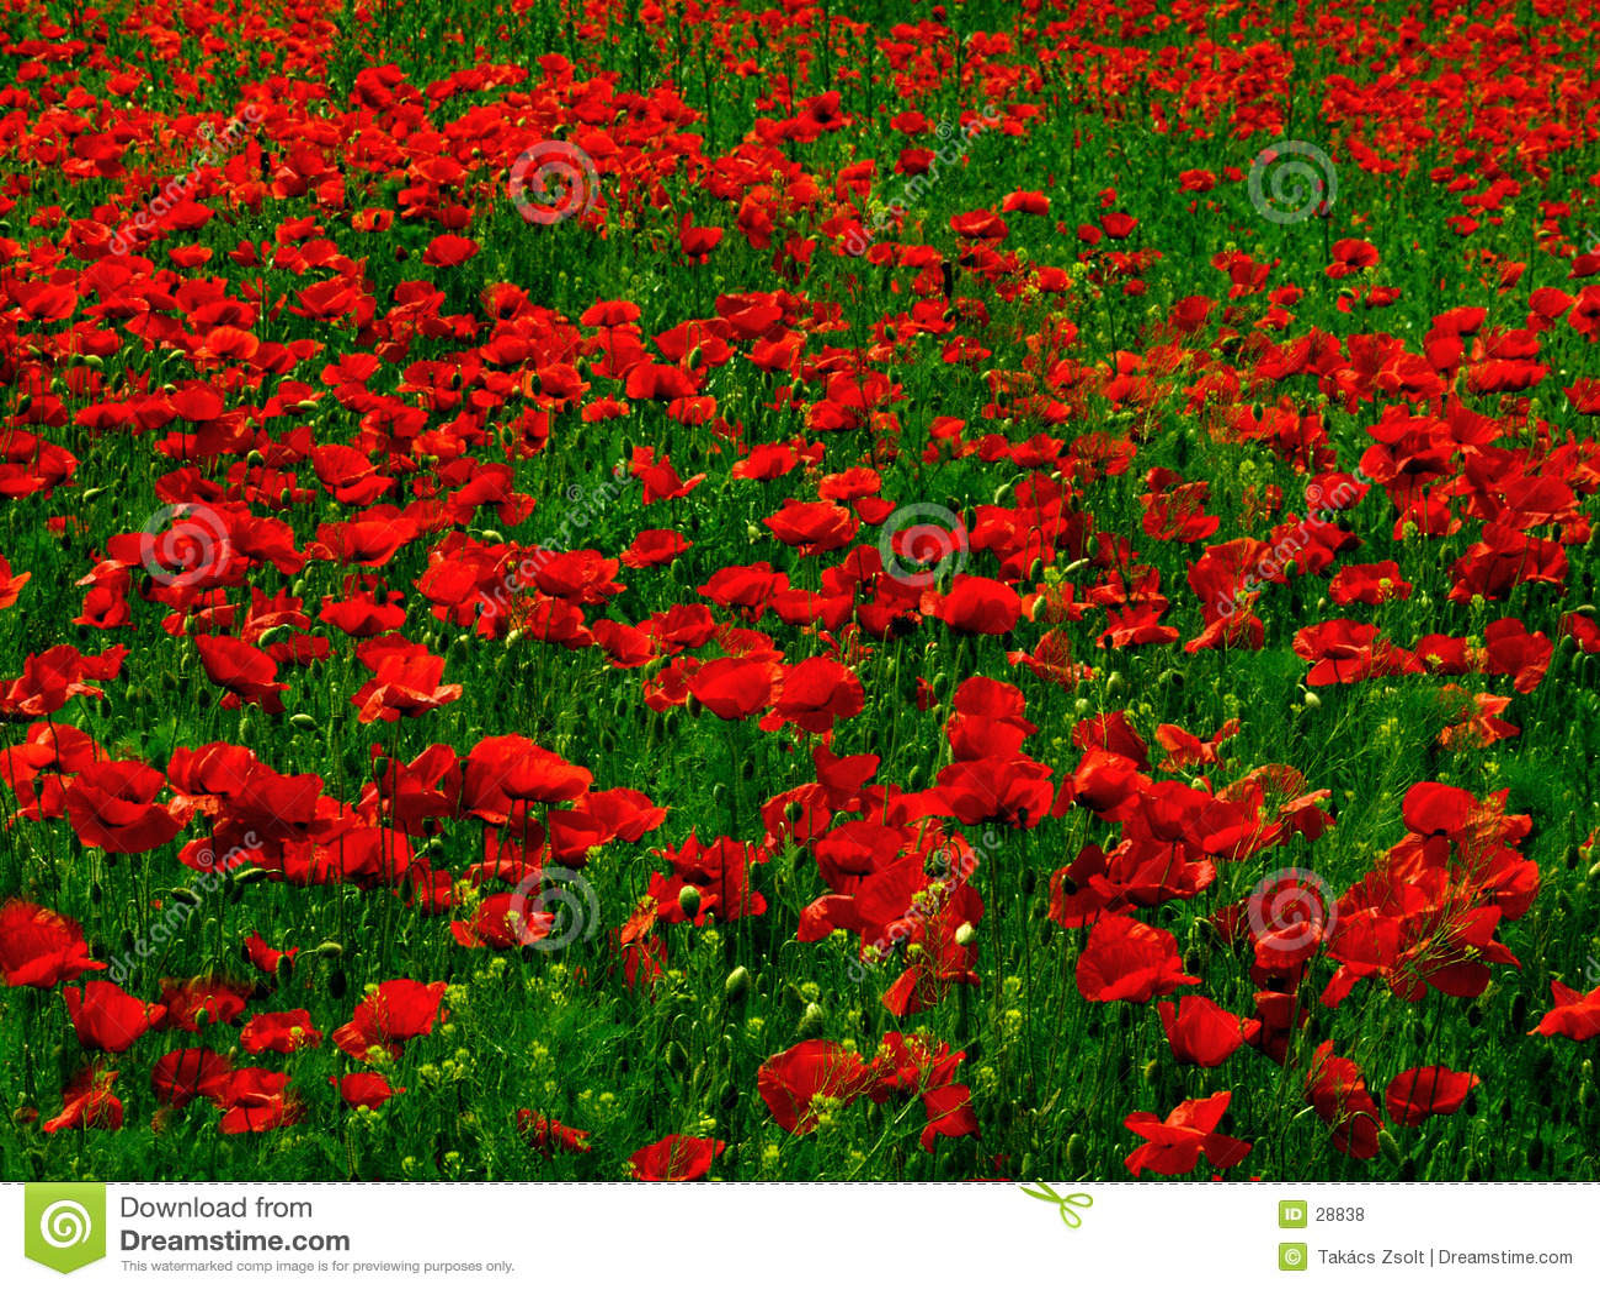 Poppy pole